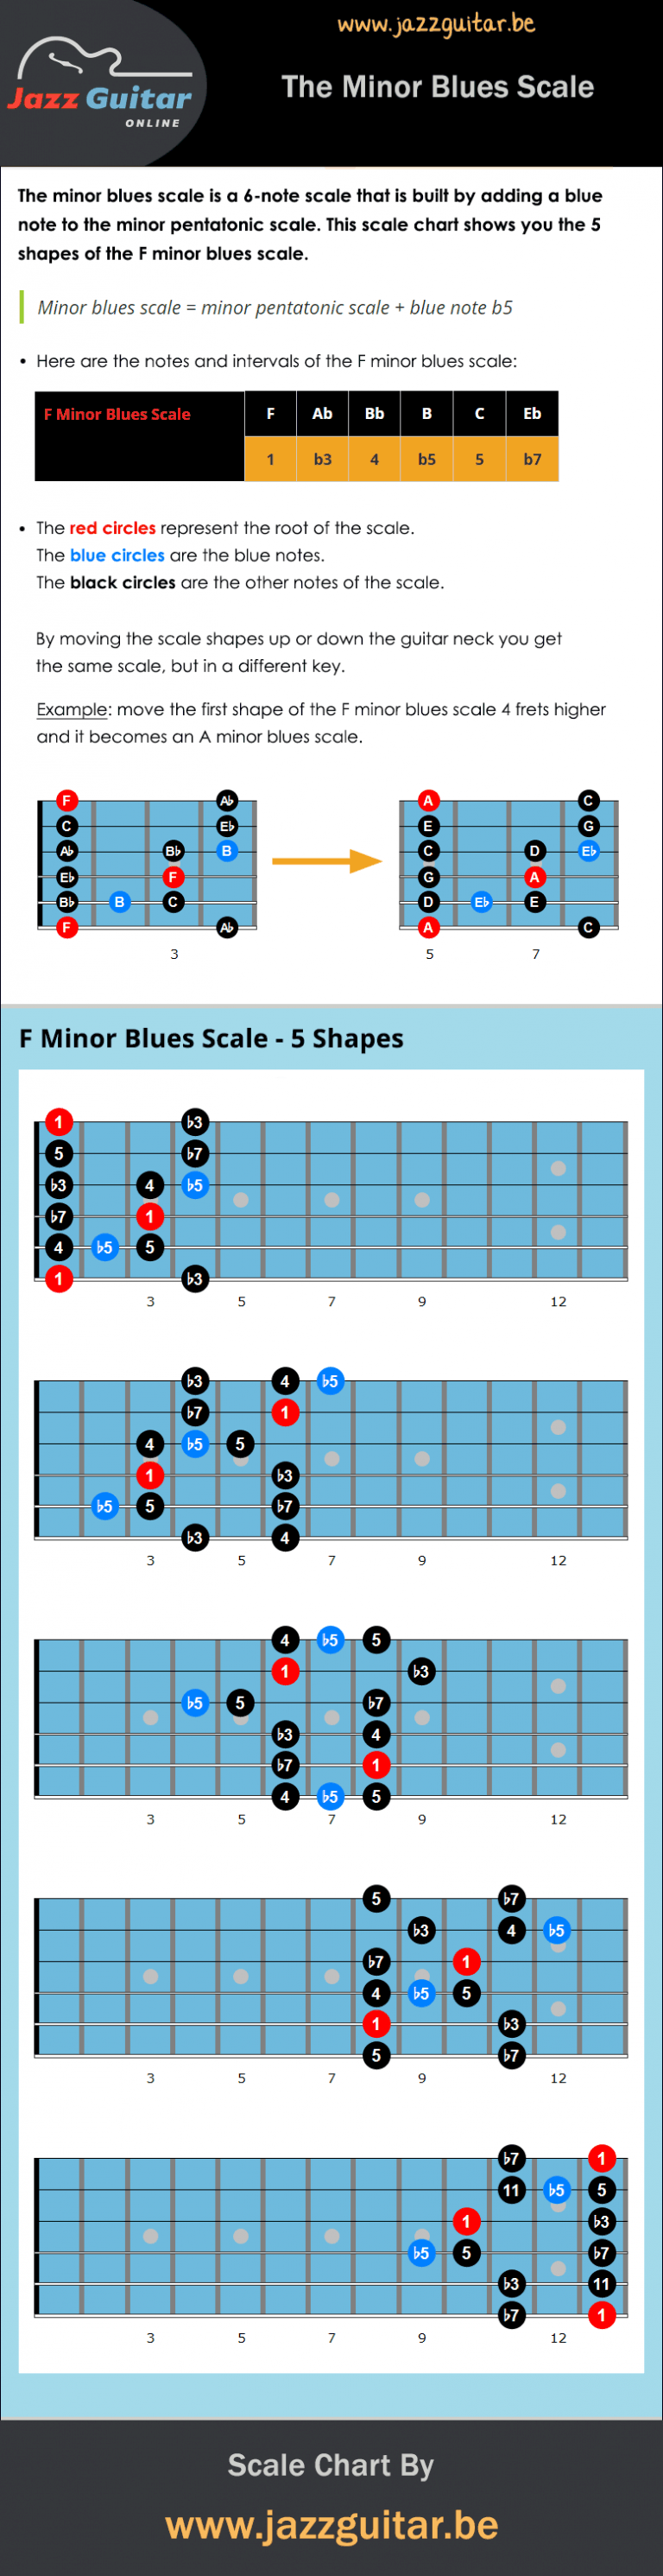 Minor blues scale chart